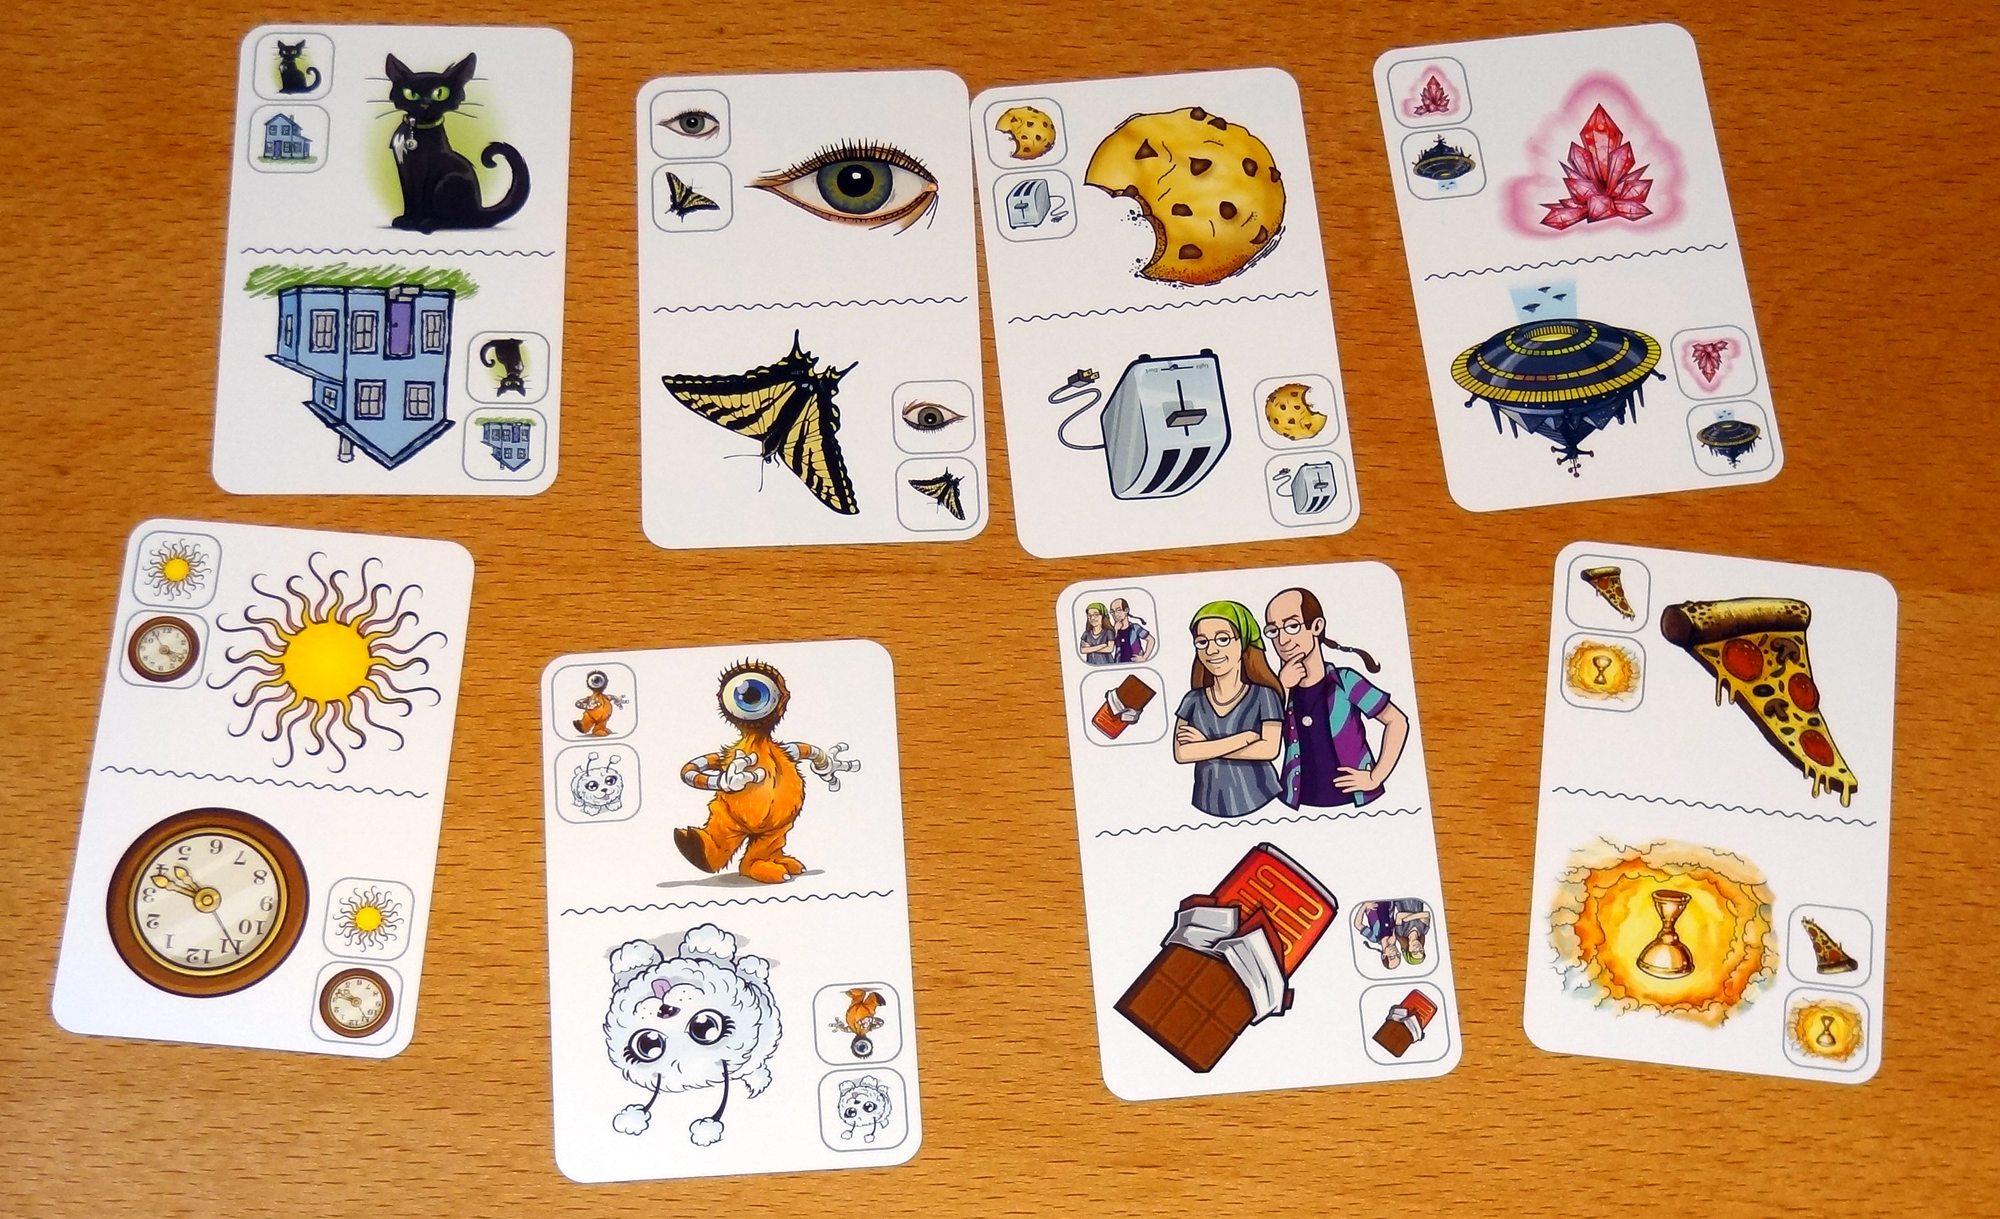 Loonacy cards